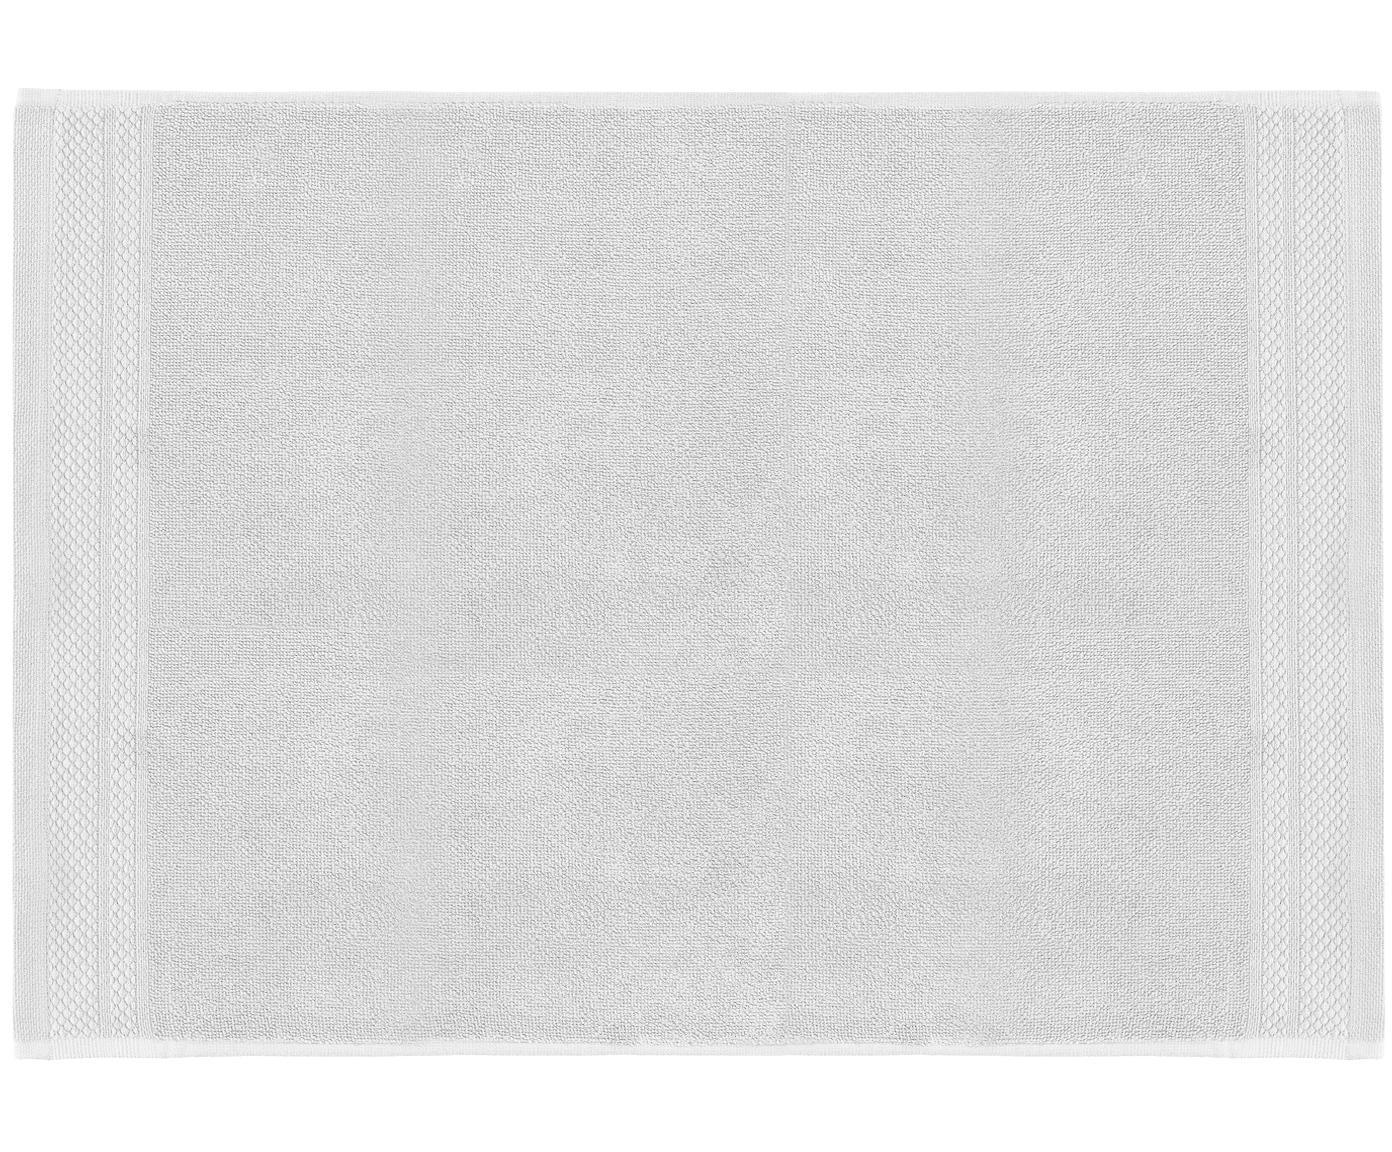 Alfombrilla de baño Premium, antideslizante, 100%algodón Gramaje superior 600g/m², Gris claro, An 50 x L 70 cm